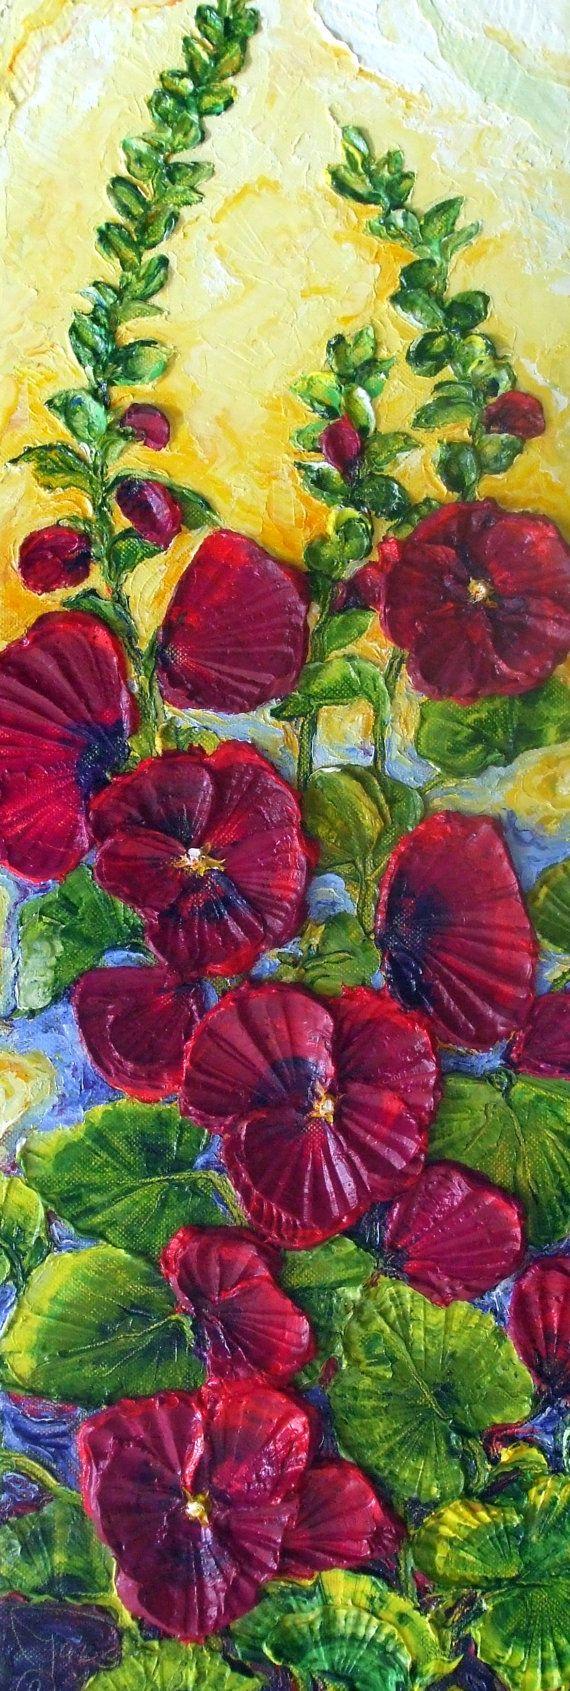 Deep Red Hollyhocks Original Impasto Oil Painting by Paris Wyatt Llanso via Etsy